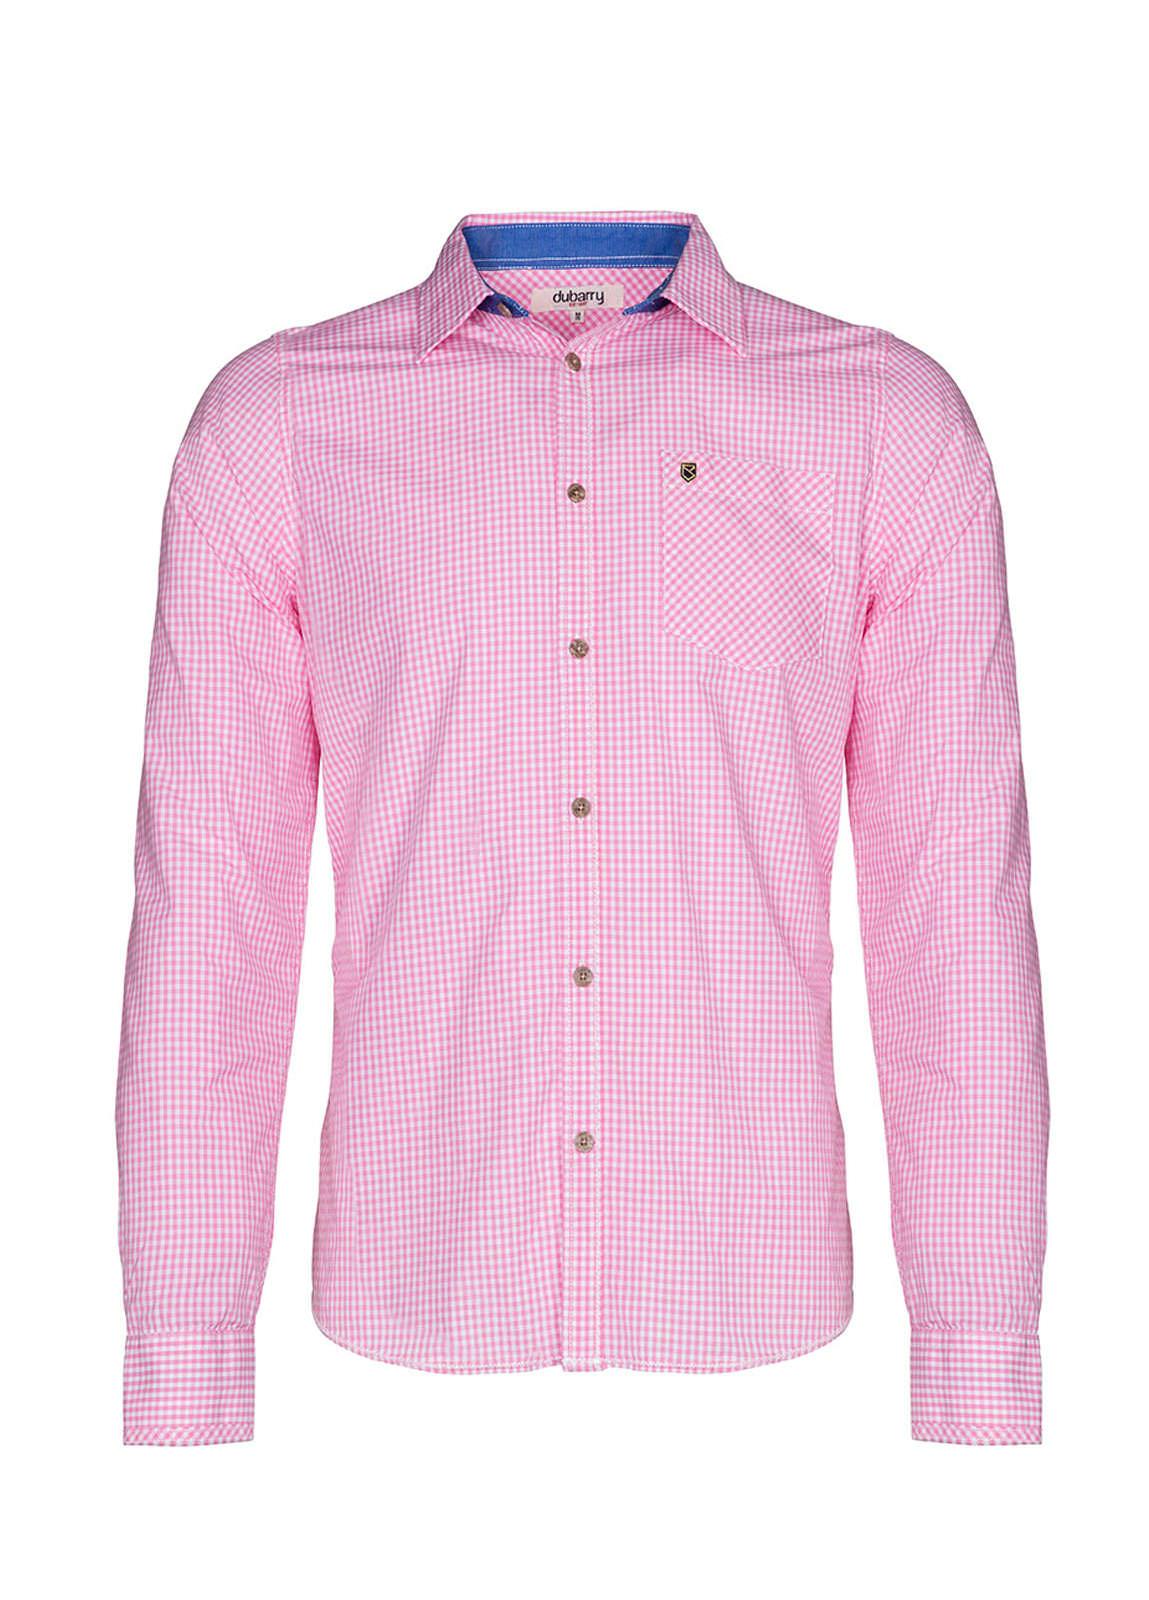 Dubarry_ Clonbrock Shirt - Pink_Image_2